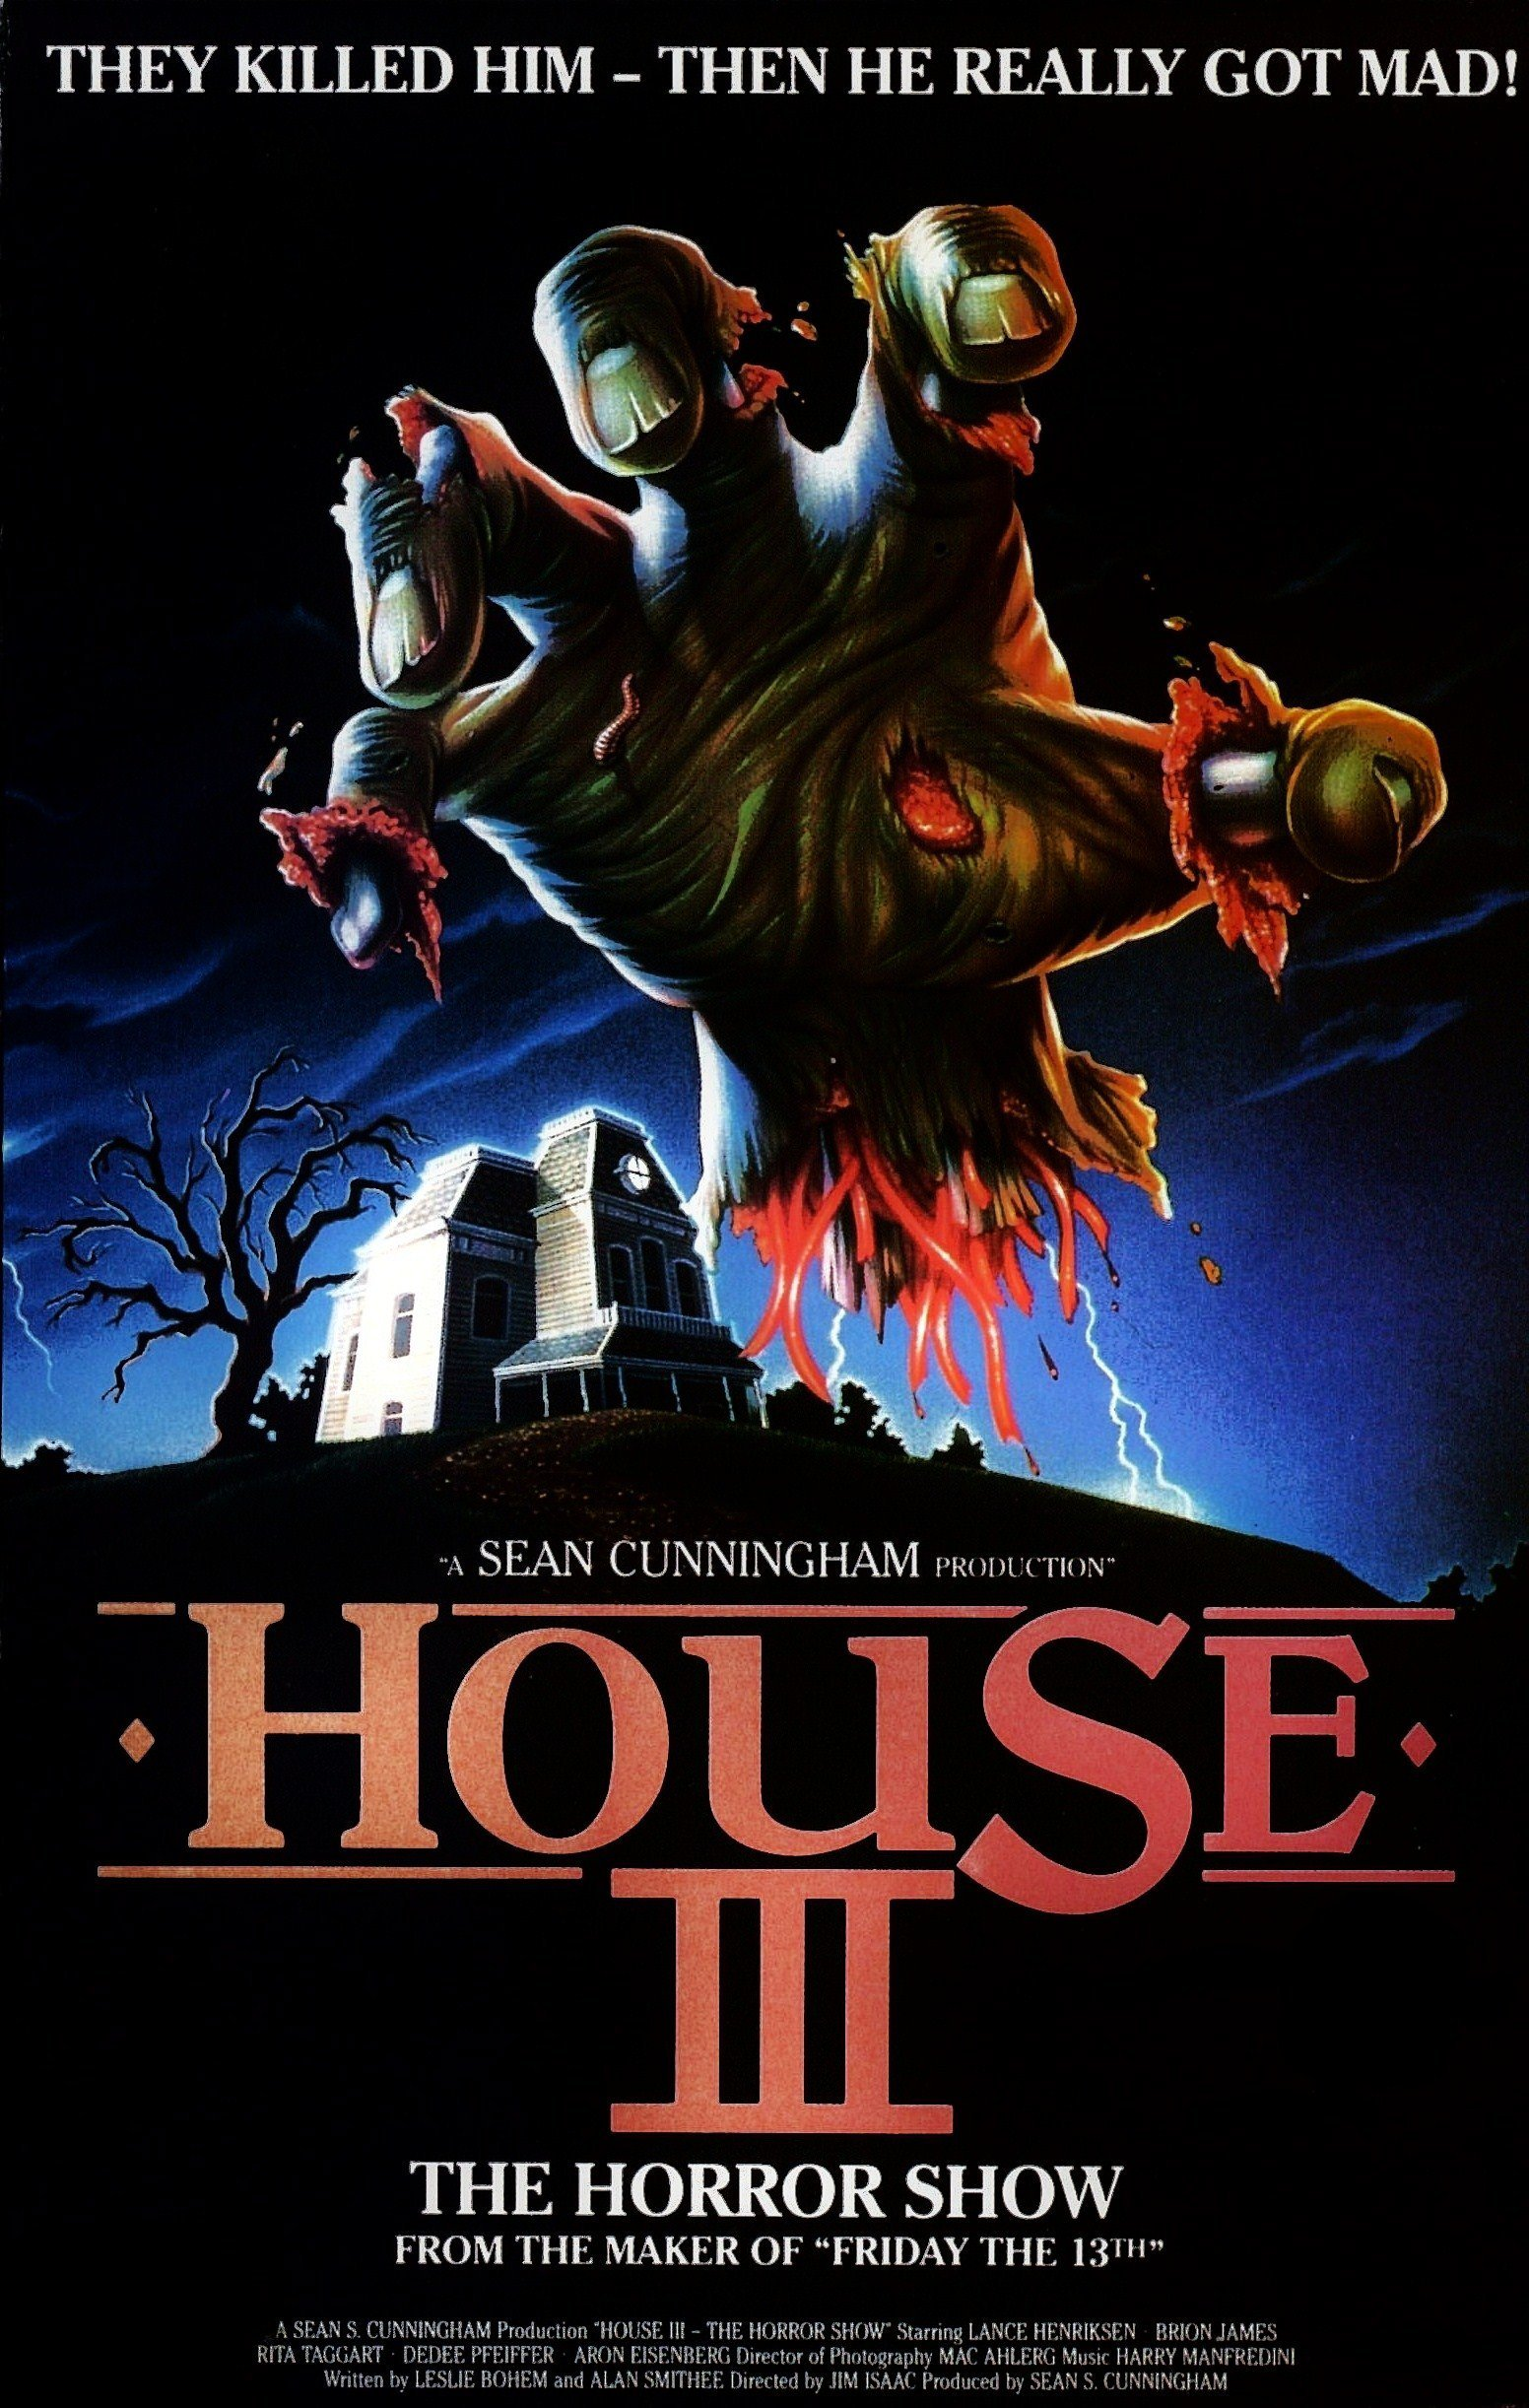 the-horror-show-1kite44the-horror-show-1the-horror-show-13the-horror-show-17the-horror-show-6